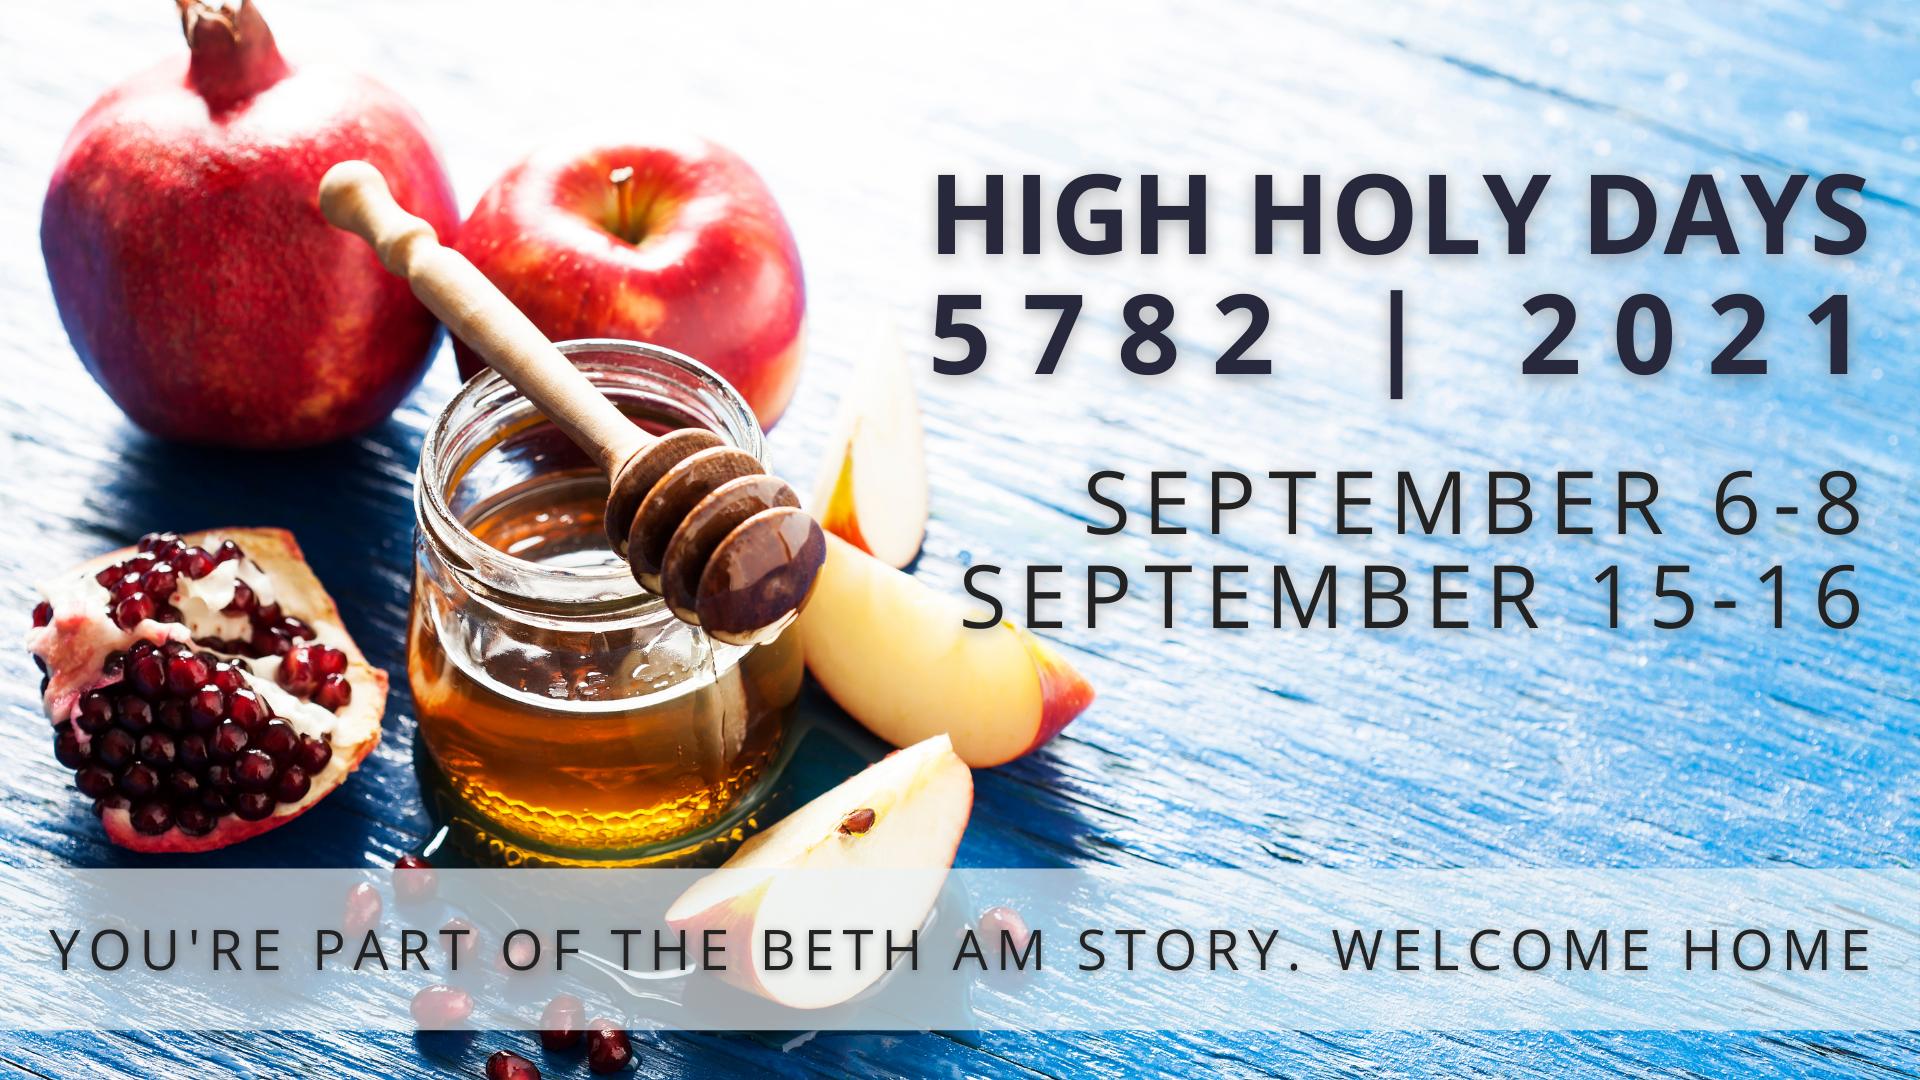 High Holy Days at Beth Am